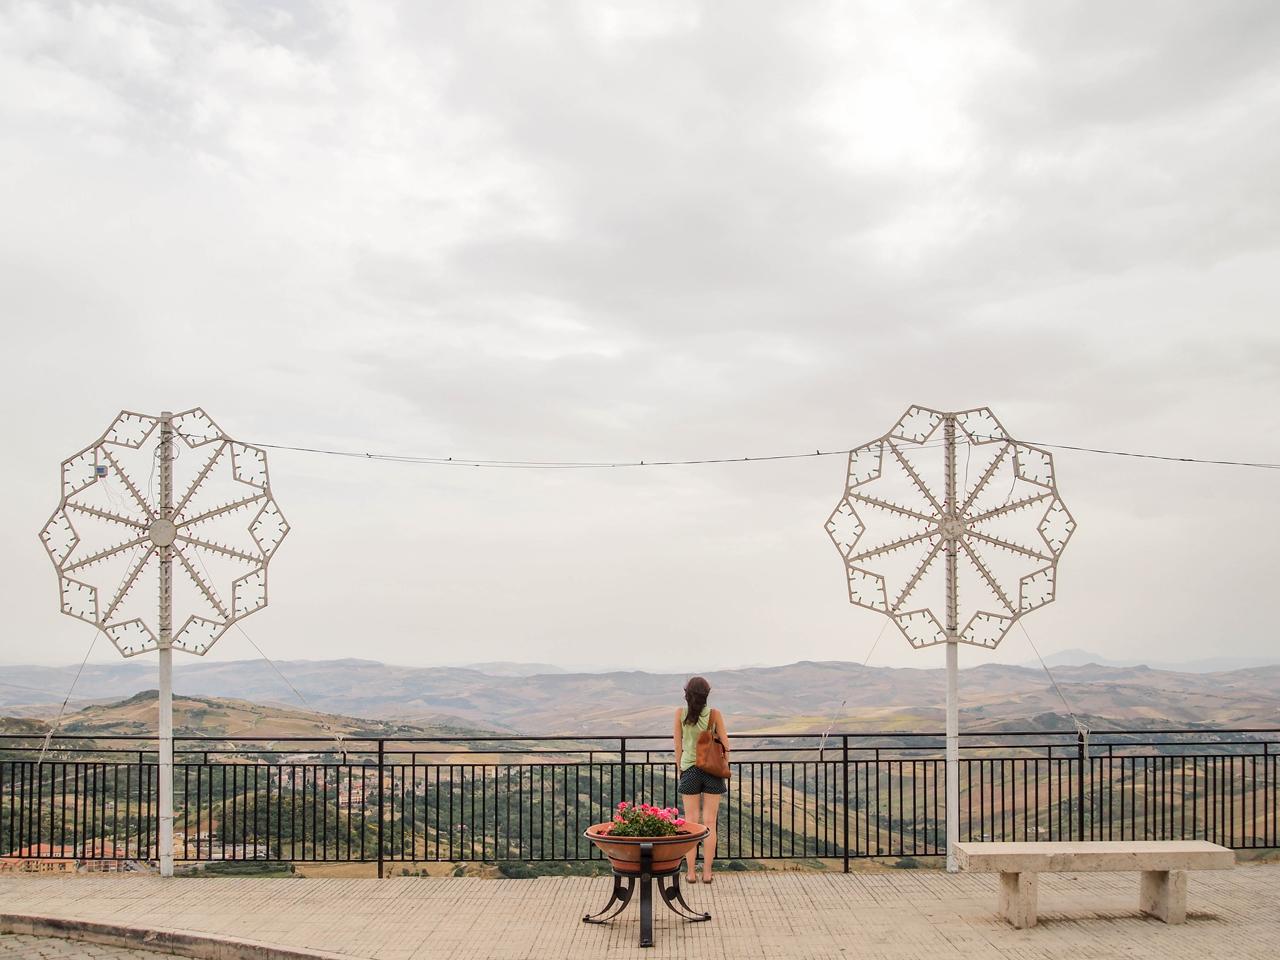 Enjoying the view from Petralia